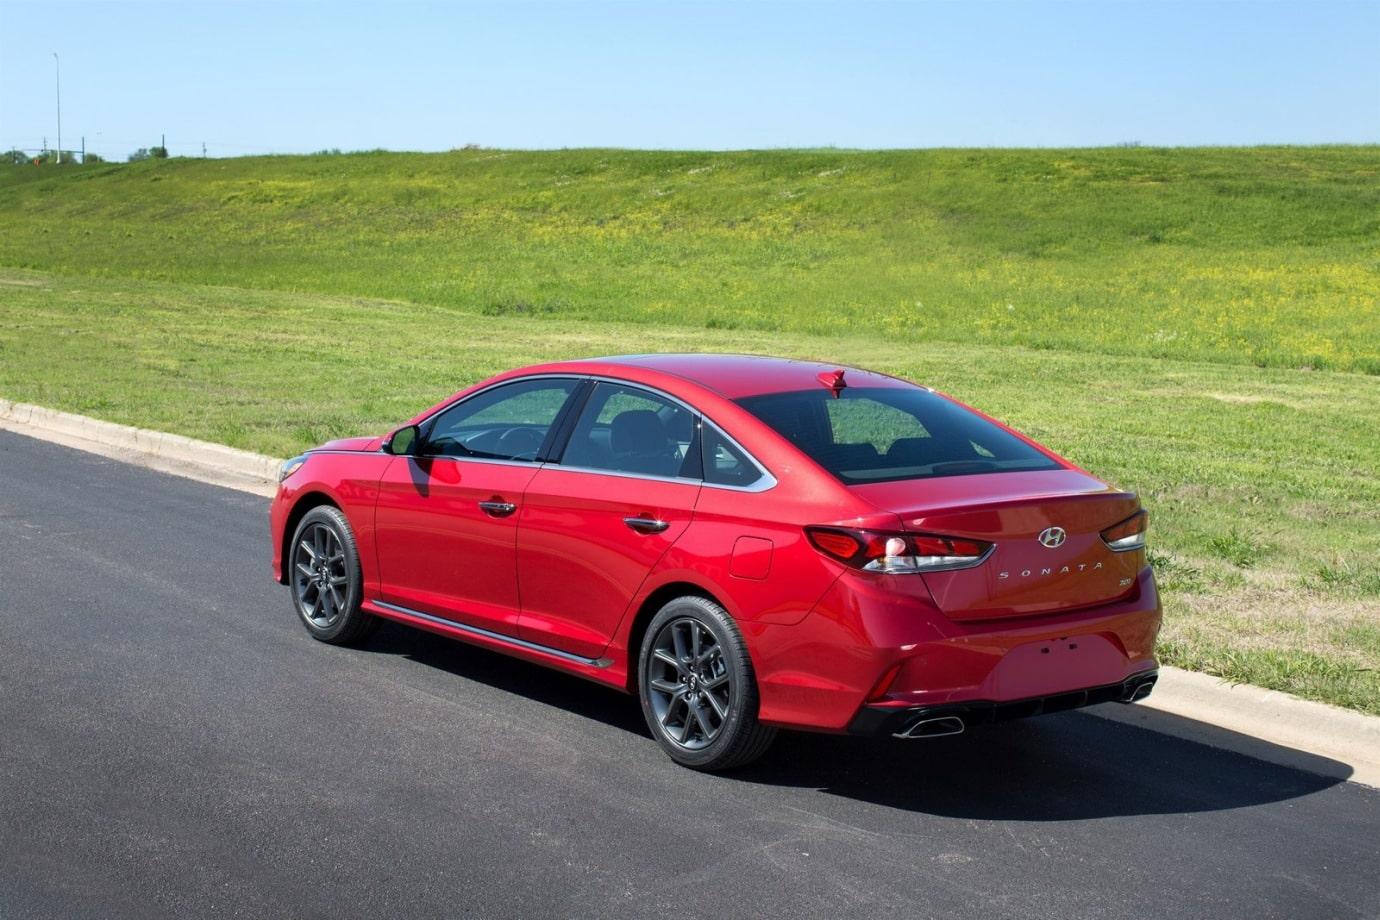 Hyundai-Sonata-USA37